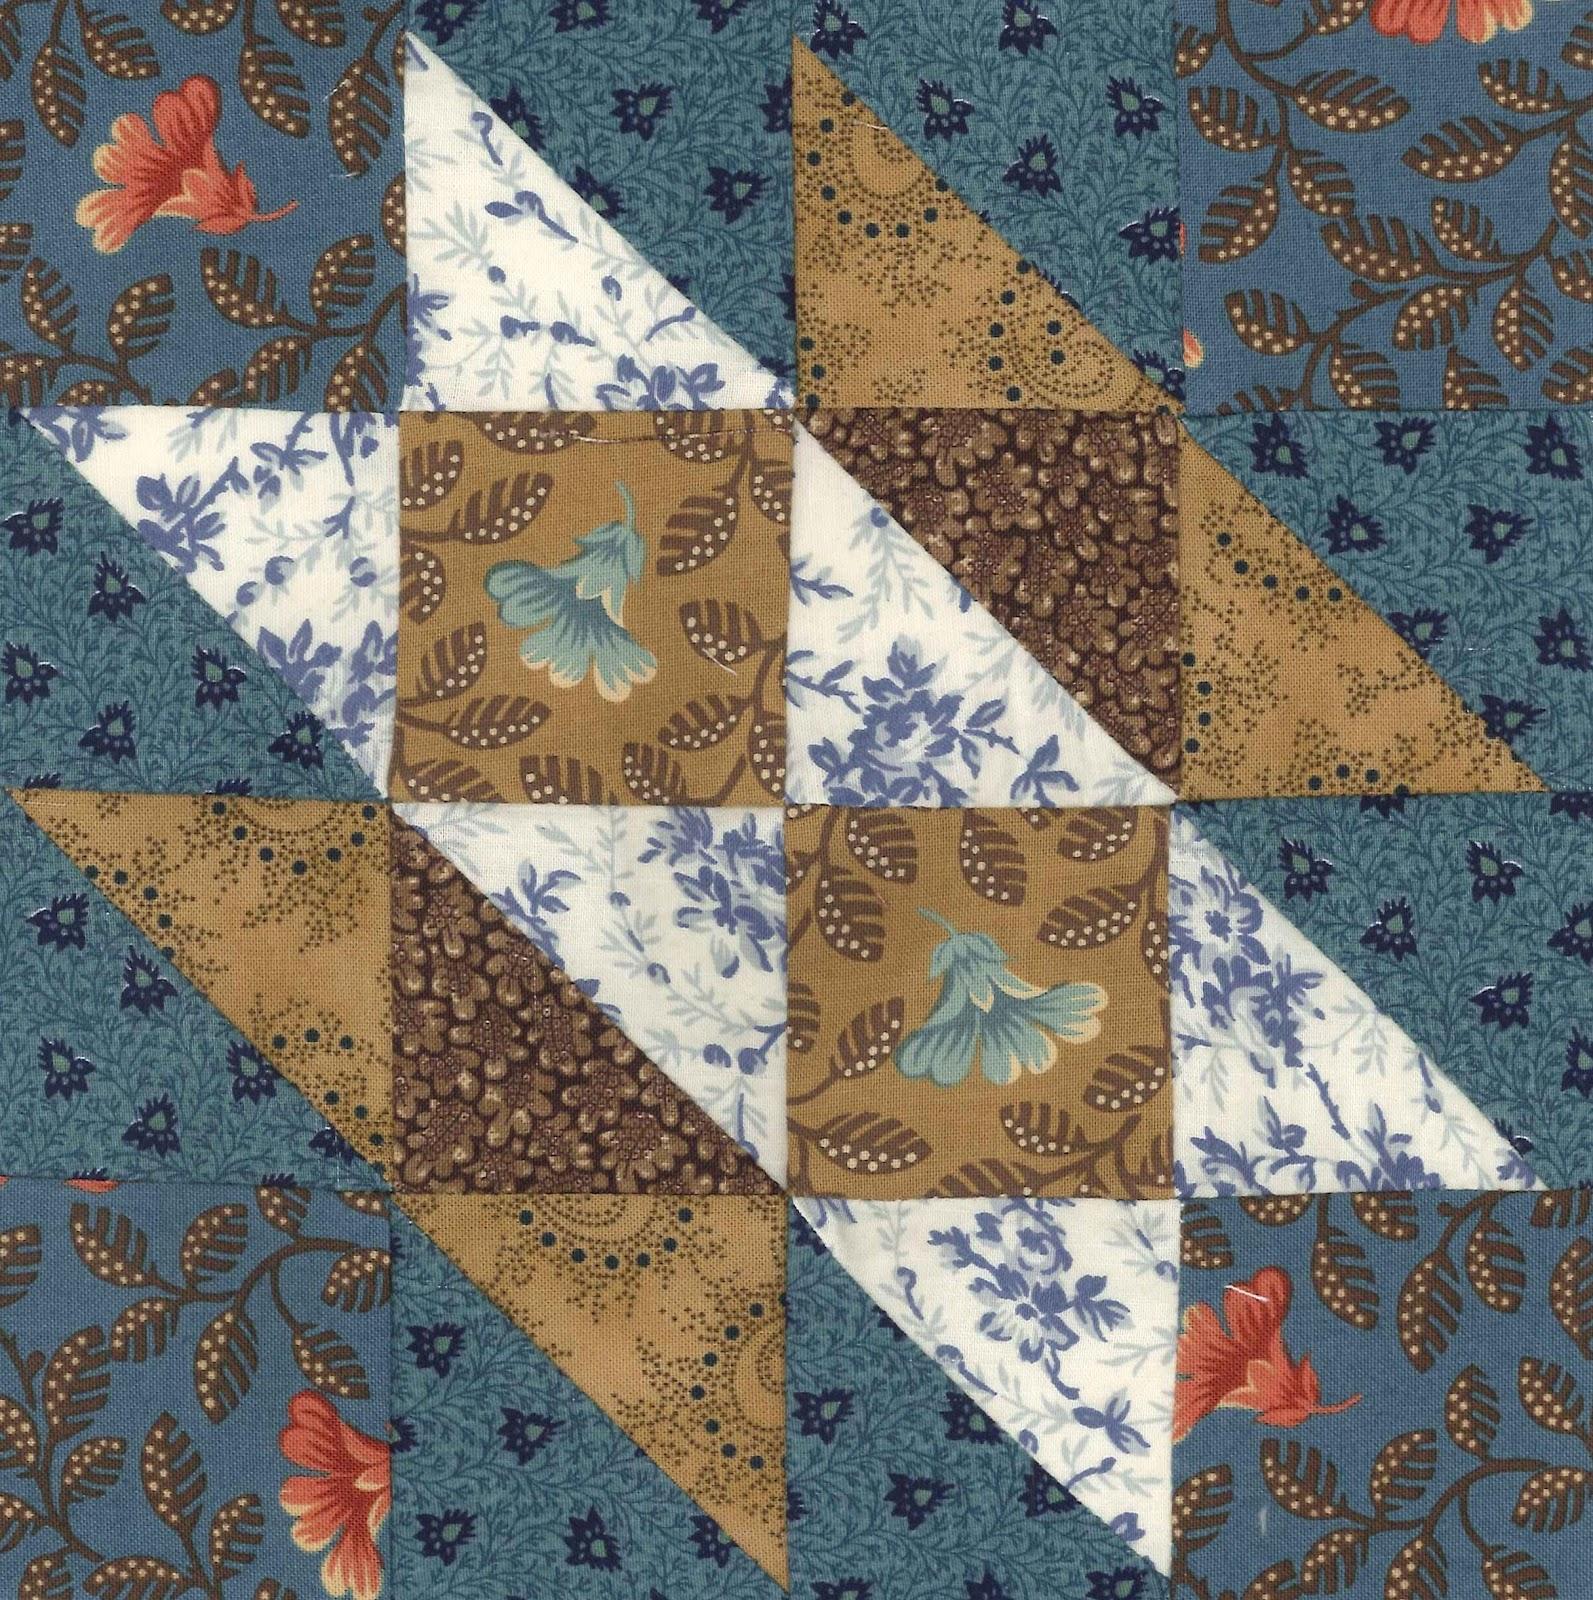 clmt quilter: Barbara Brackman's Civil War Quilt blocks : civil war quilt blocks - Adamdwight.com